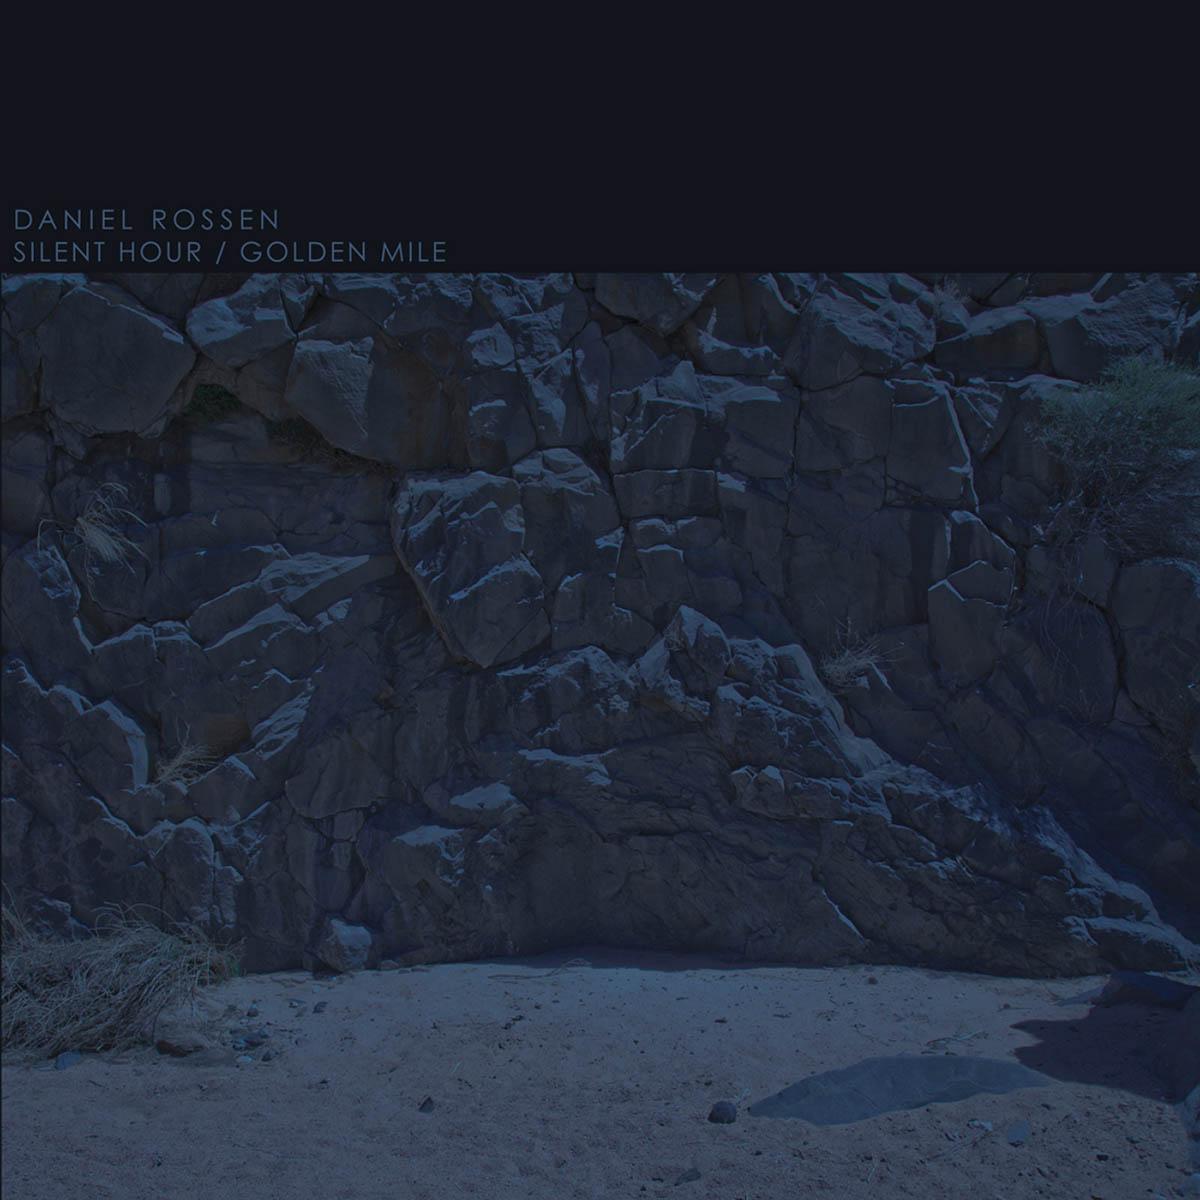 Daniel Rossen, Silent Hour/Golden Mile